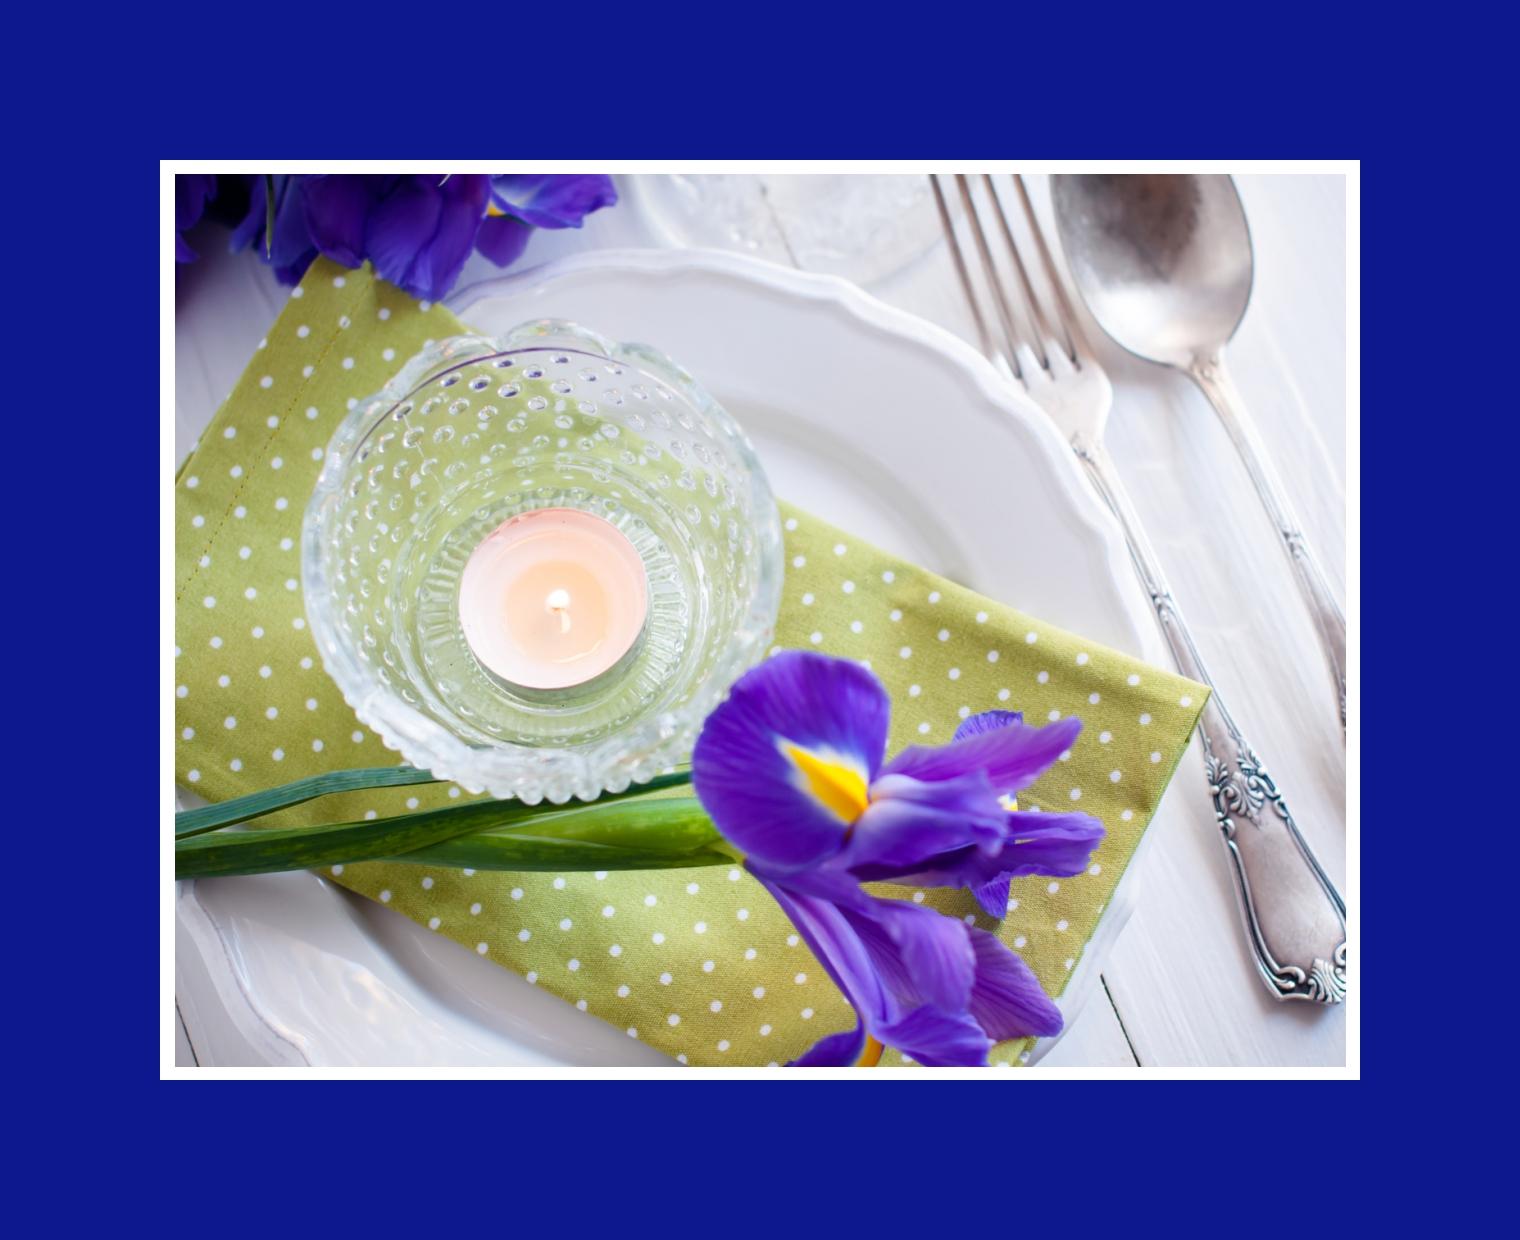 Irisblume in Tischdeko